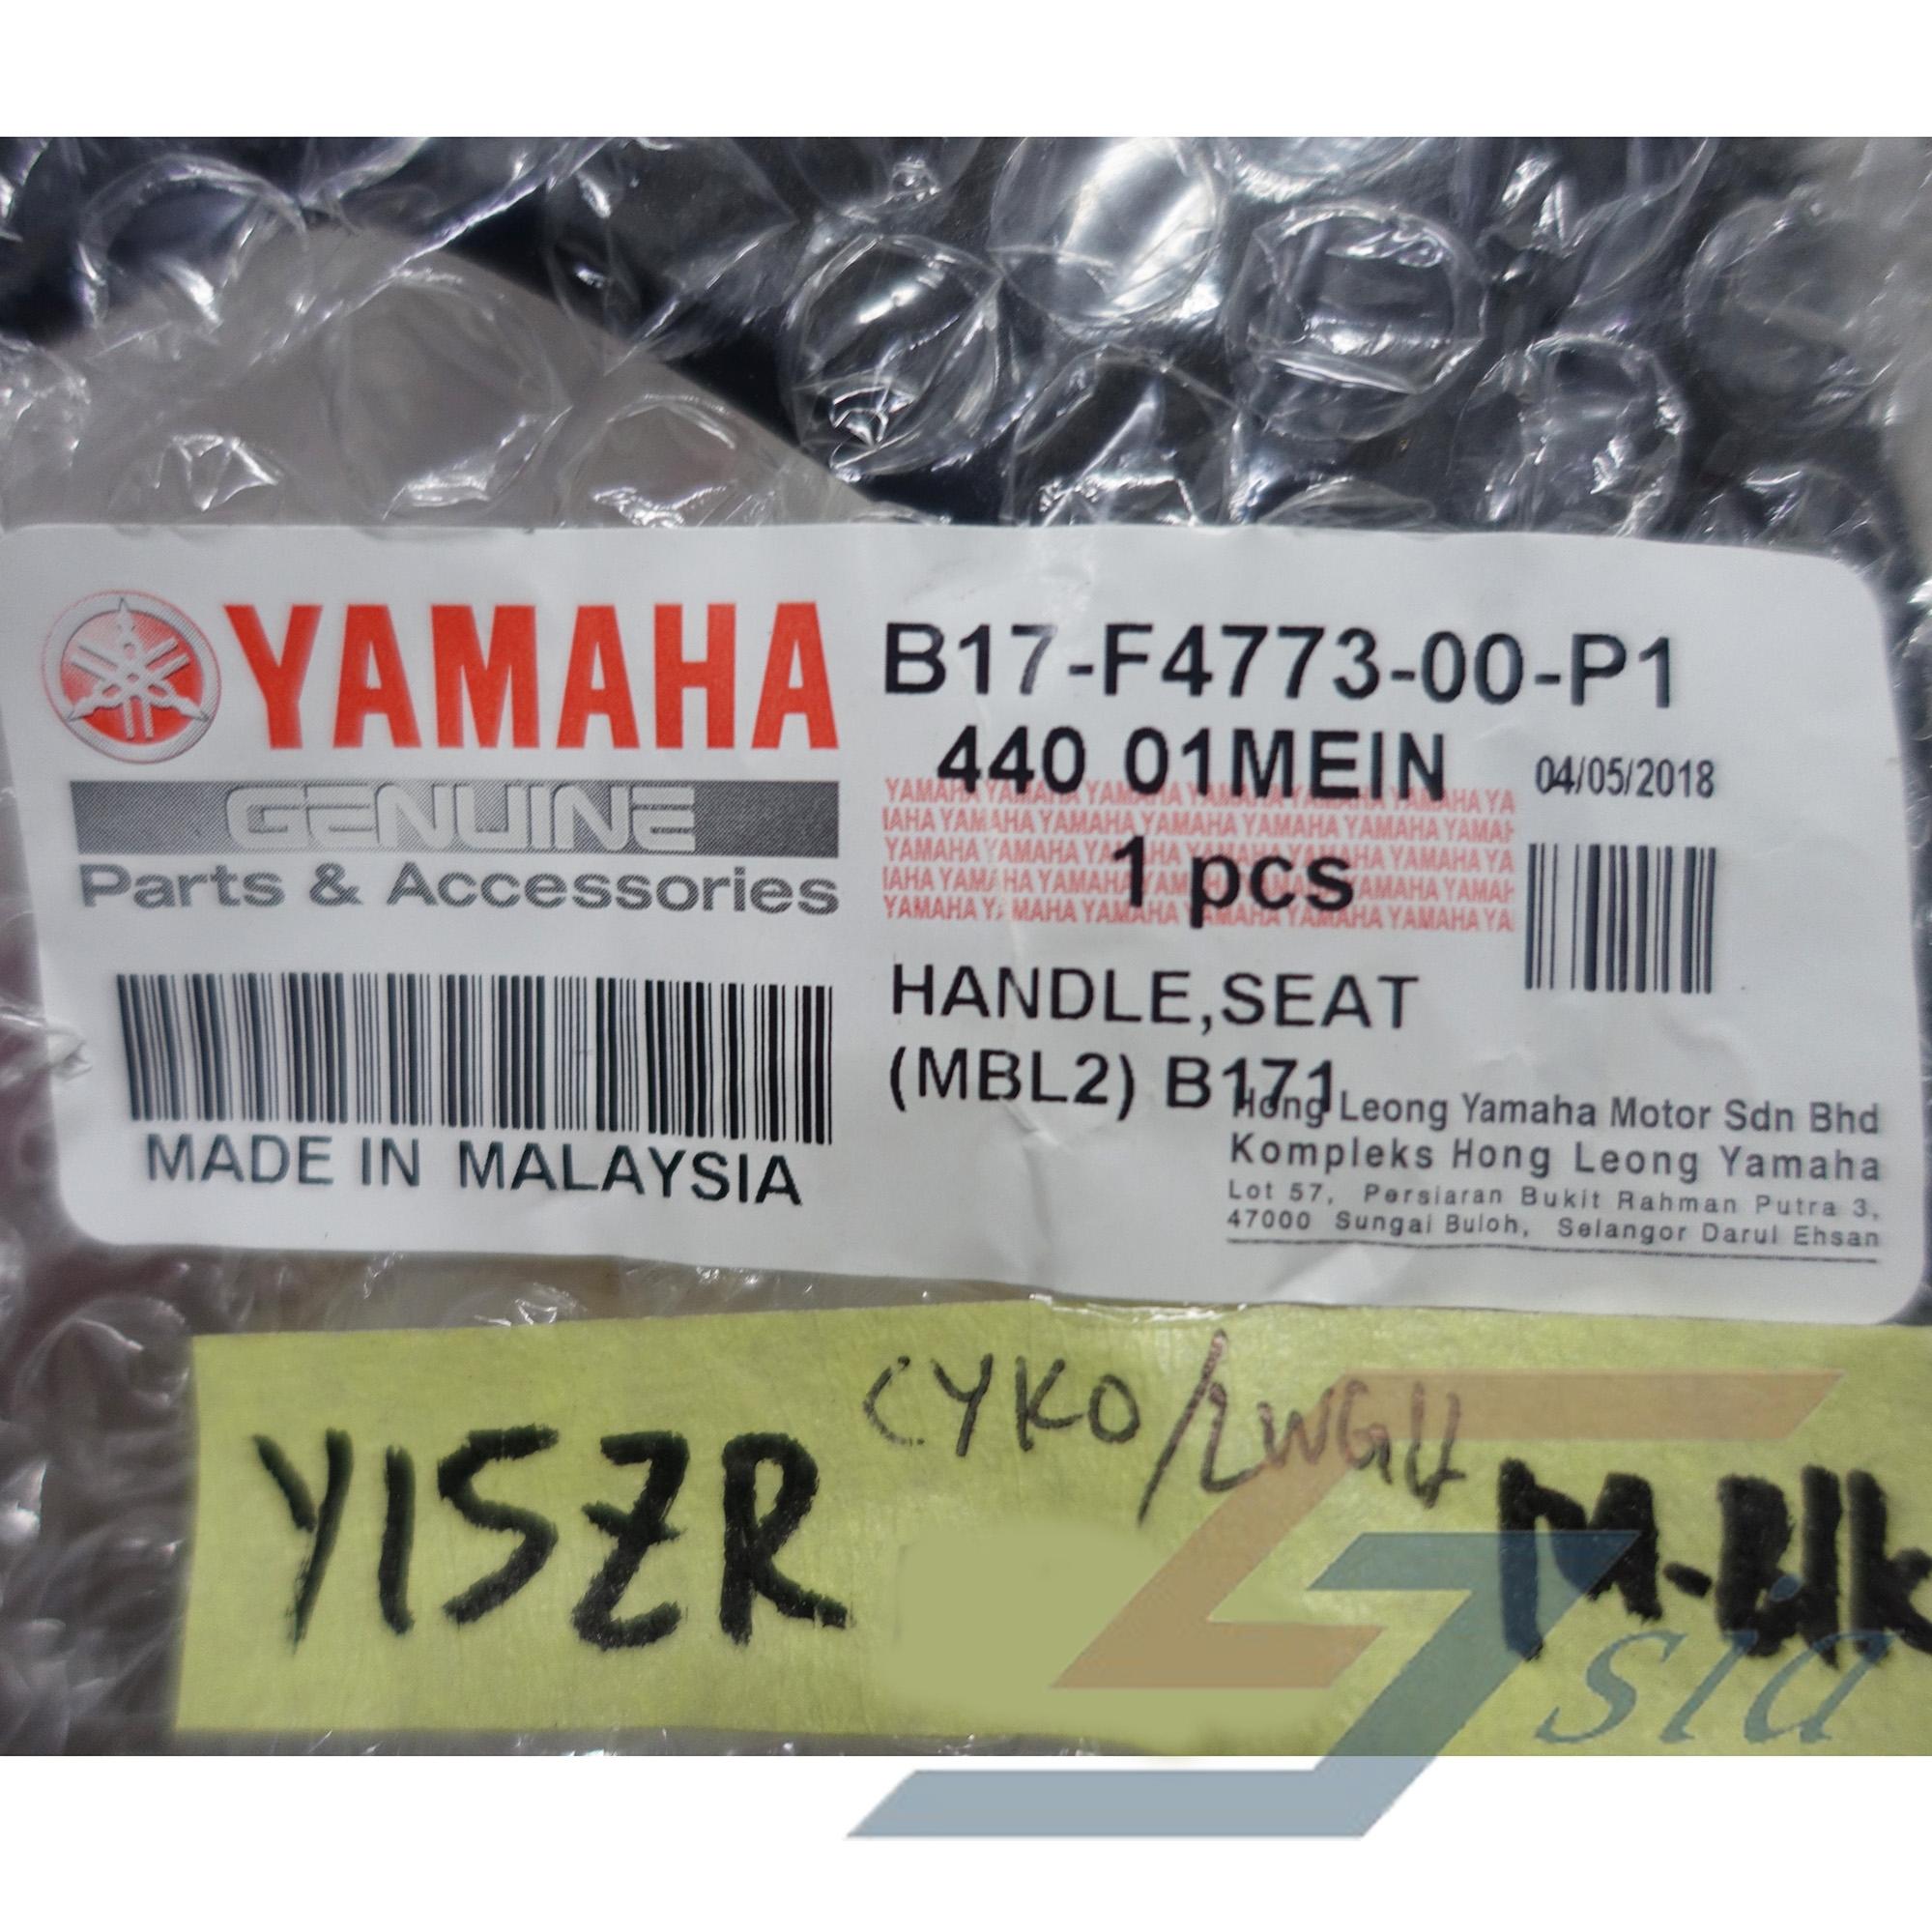 Yamaha Y15ZR Seat Handle(Genuine)(Matt Black)